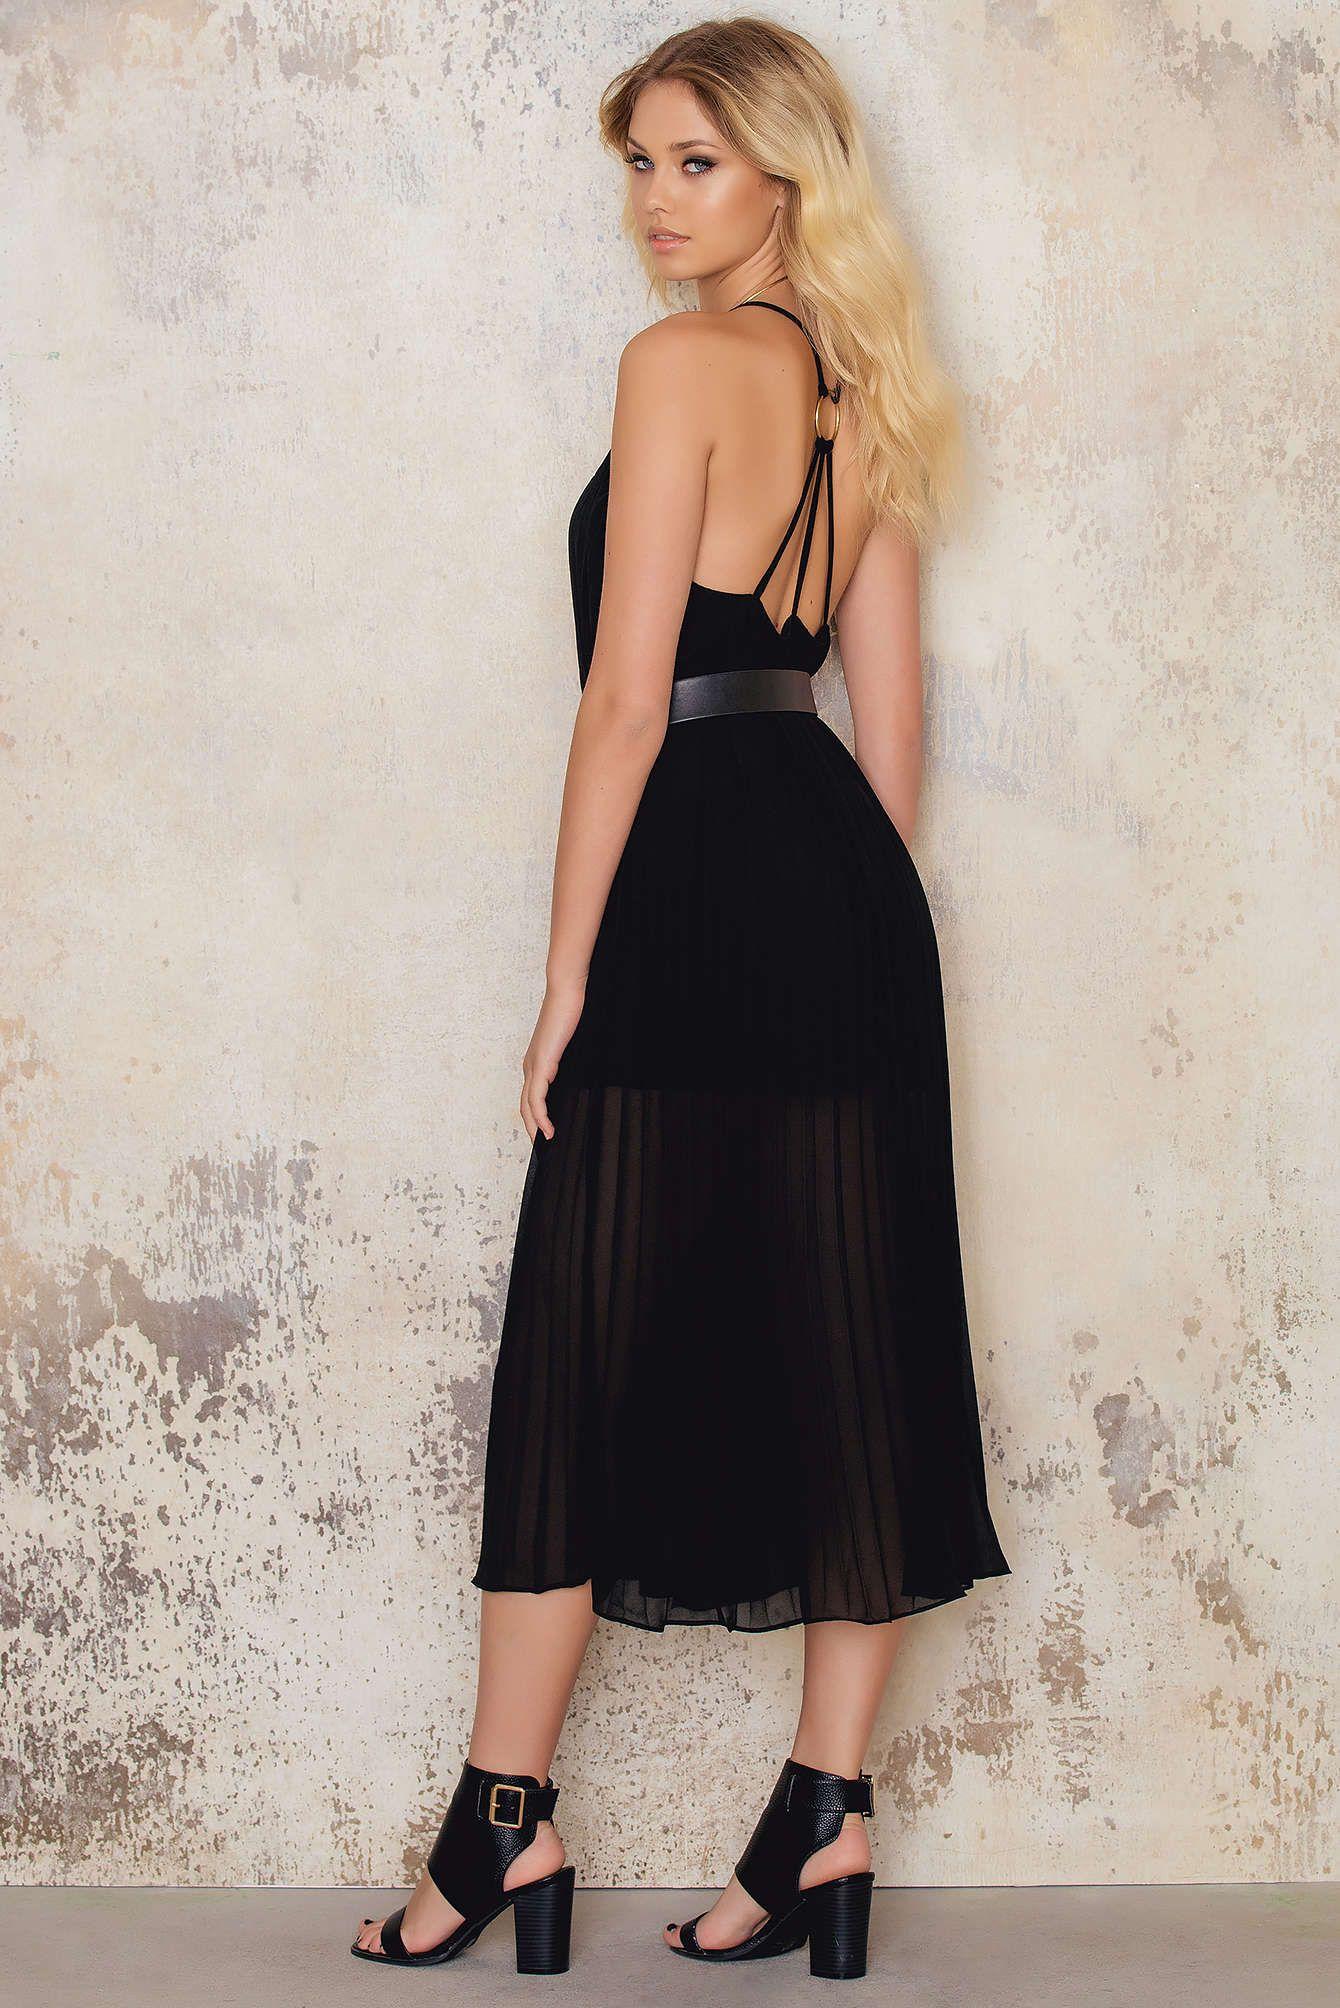 Dress for success The Pleated Chiffon Strap Midi Dress by NAKD